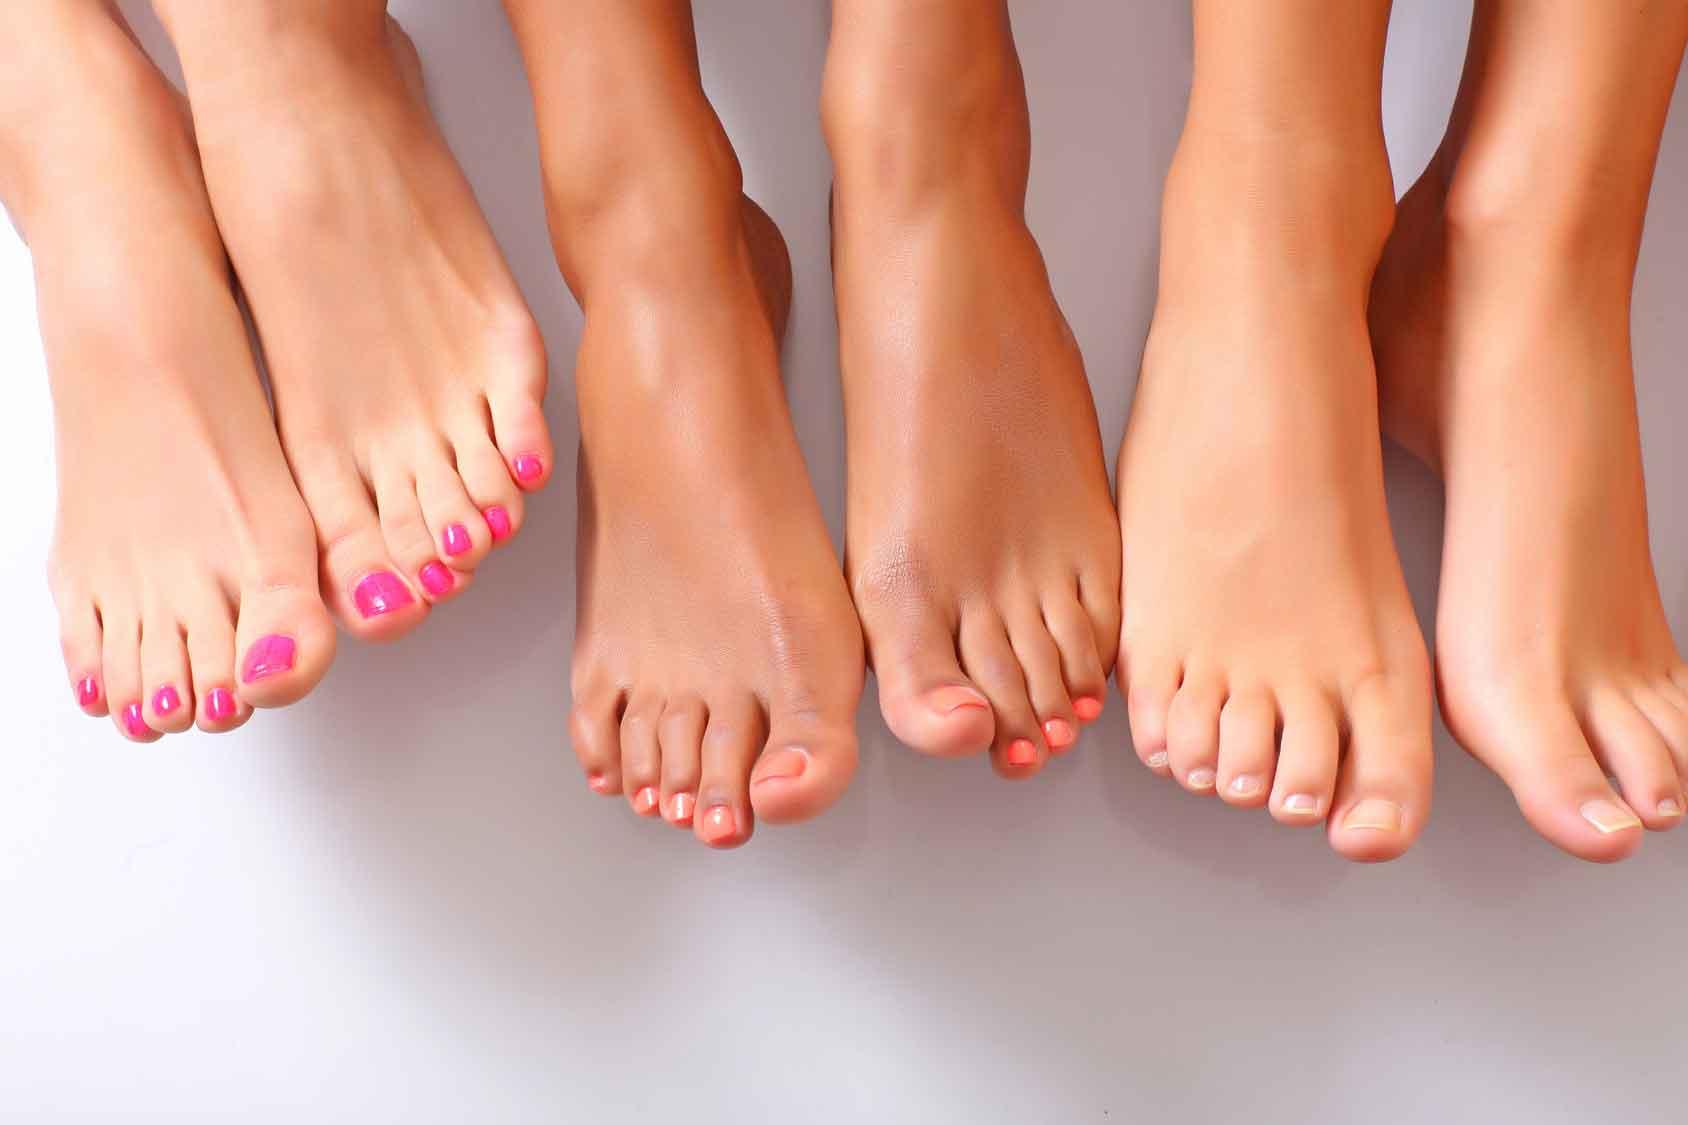 Nail-fungus-treatment-three-women-bare-foots